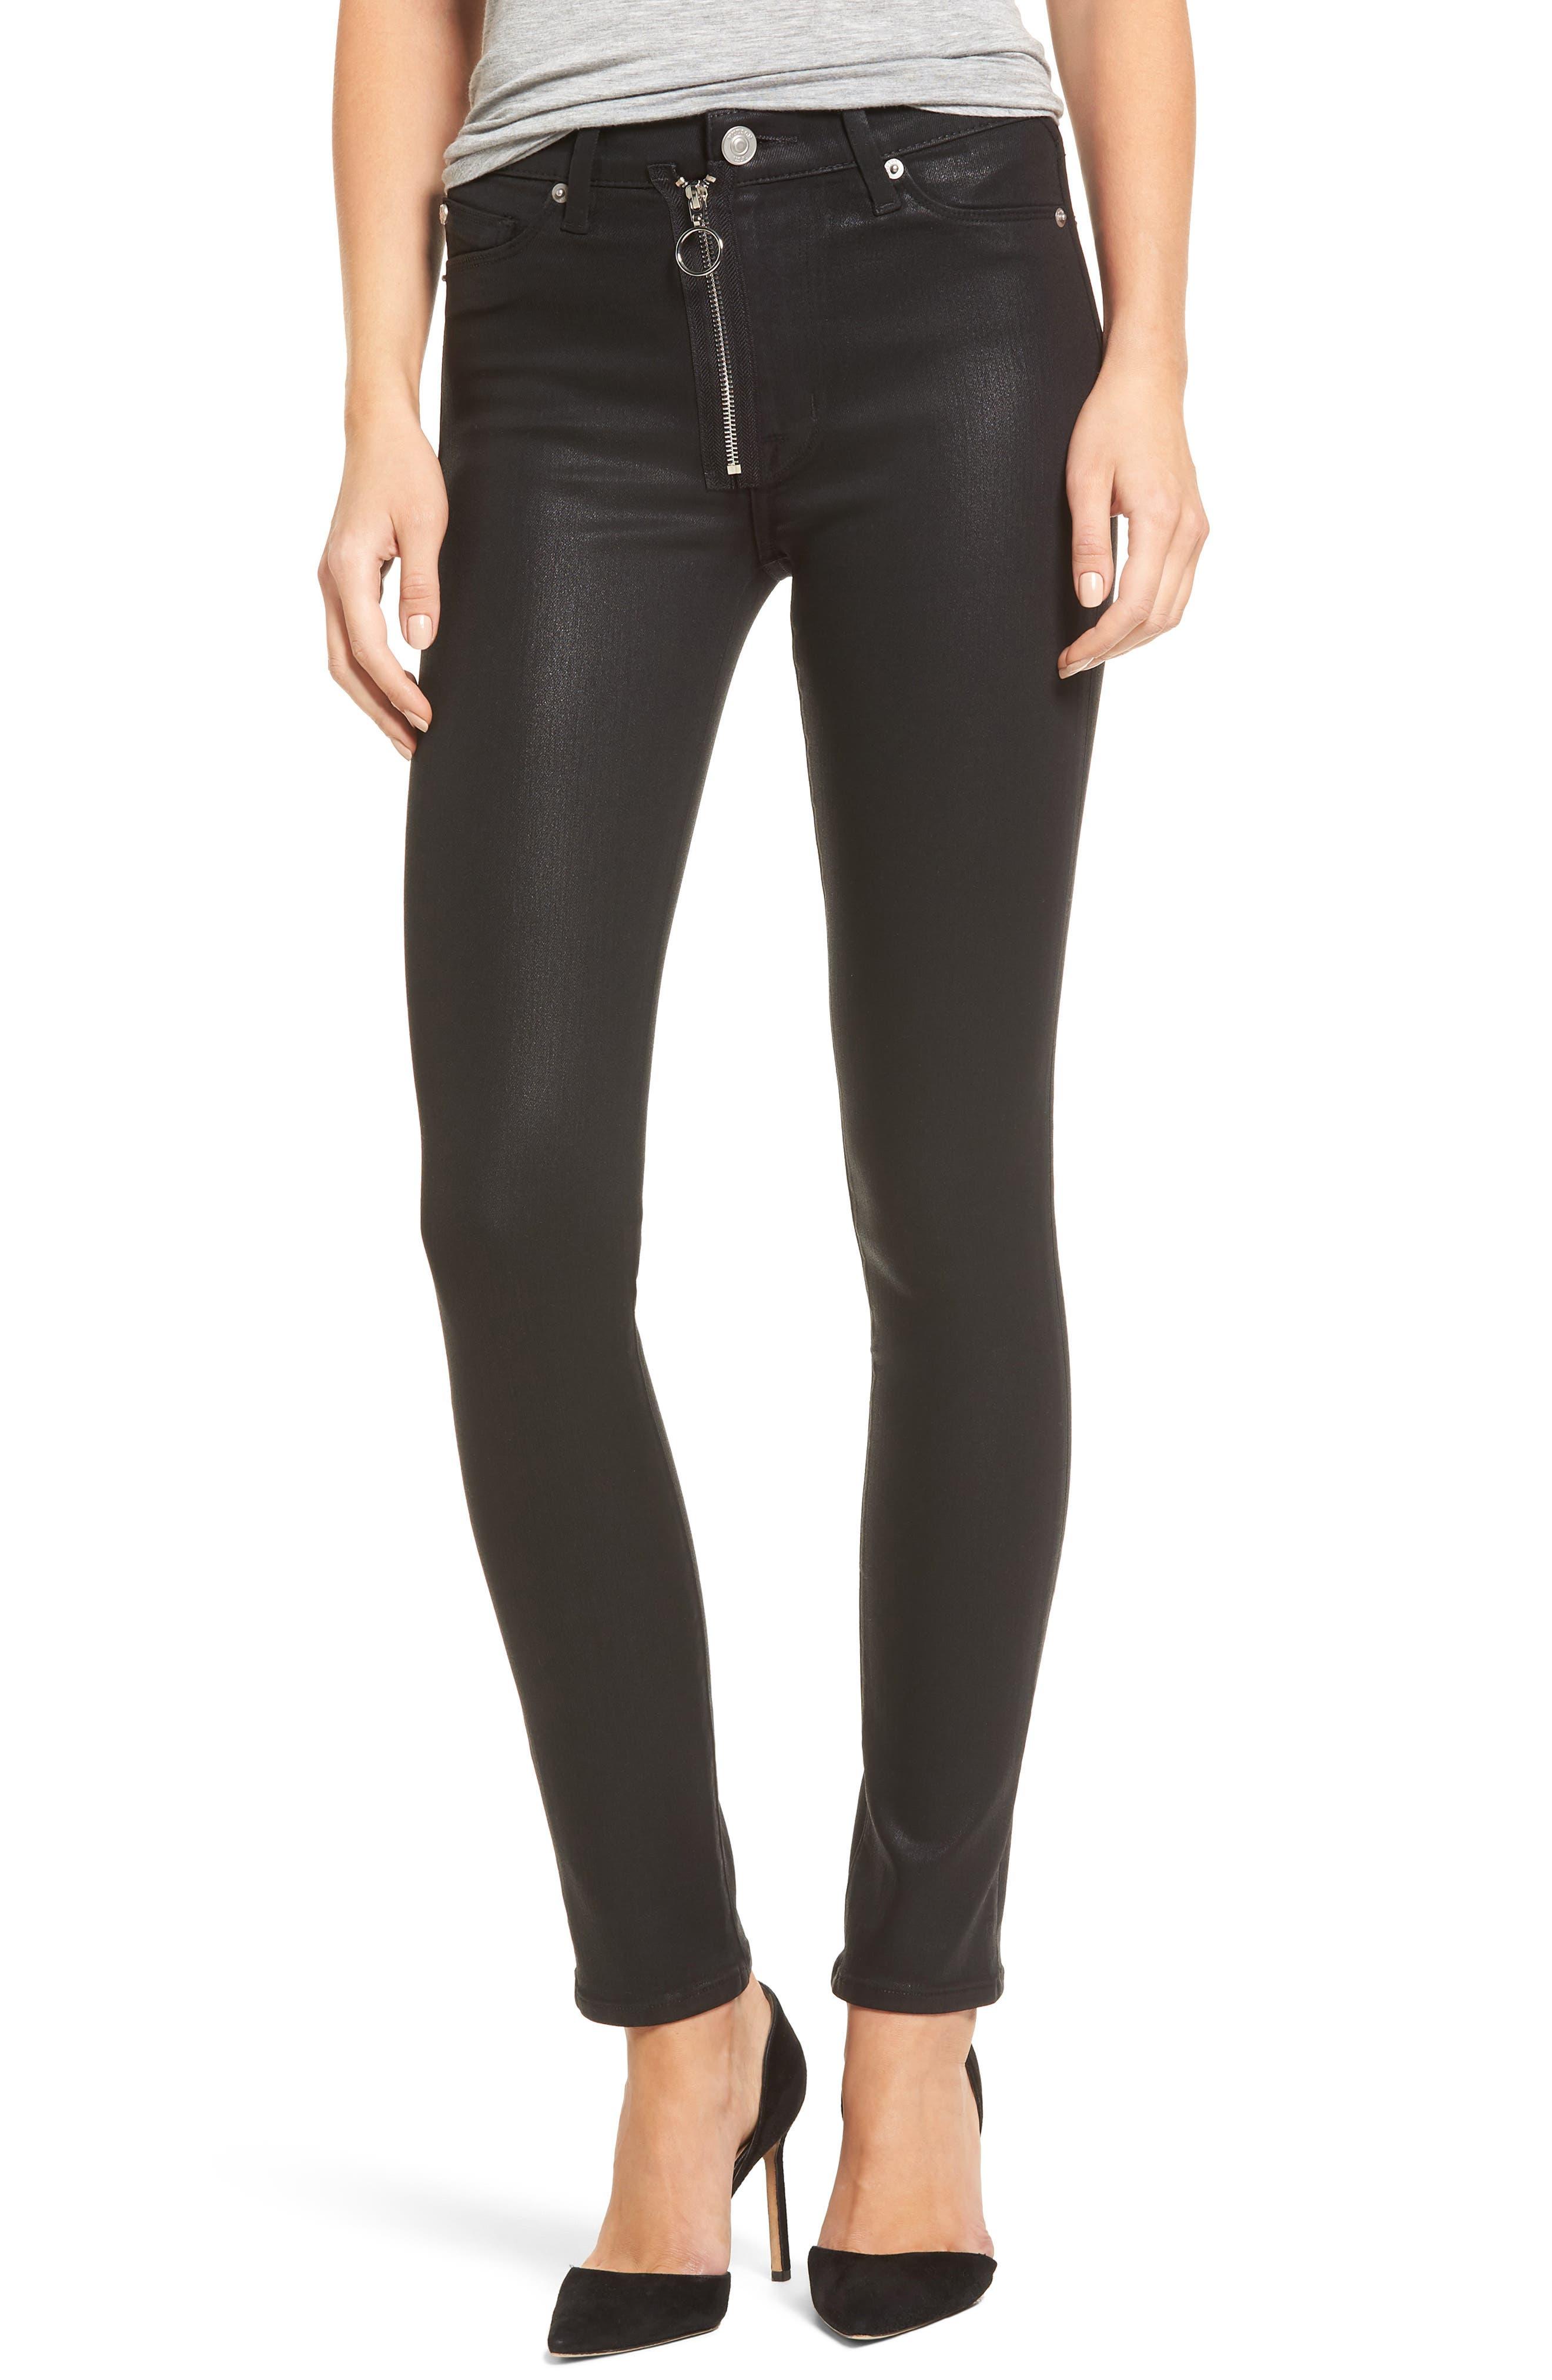 Hudson Jeans Barbara High Waist Skinny Faux Leather Pants